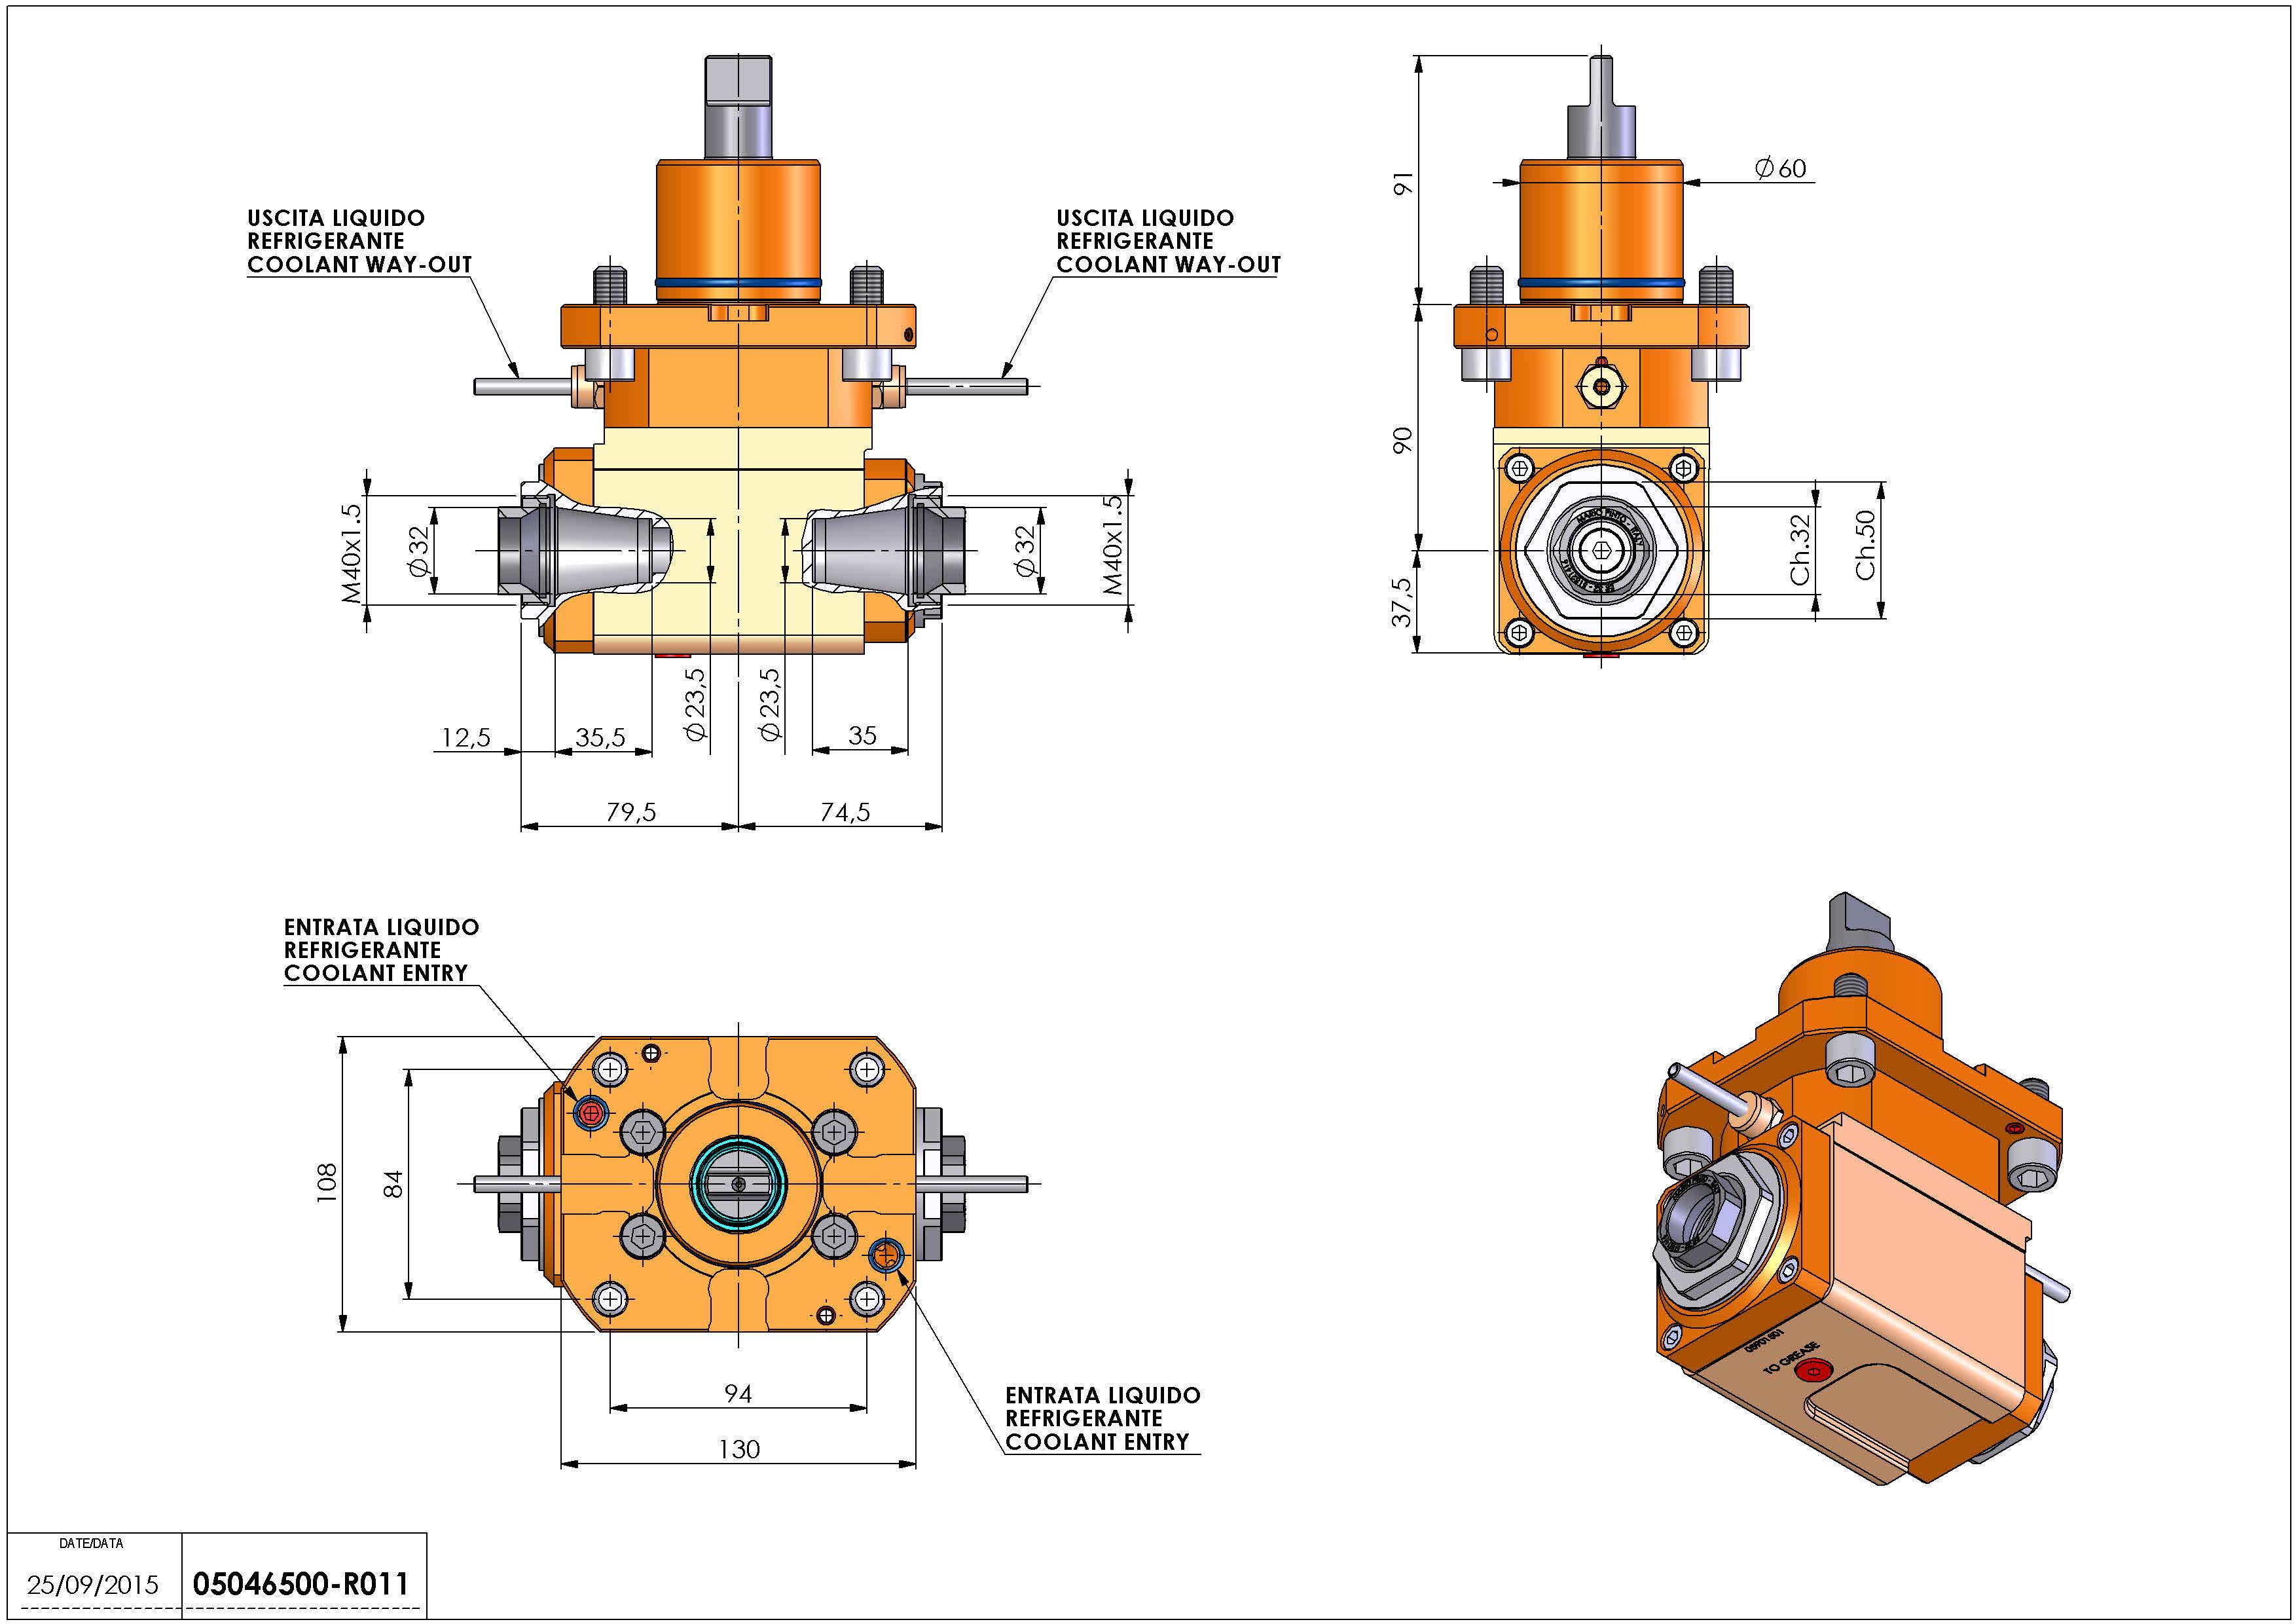 Technical image - LT-A D60 ER32F-32F LR2:1H90 MS.